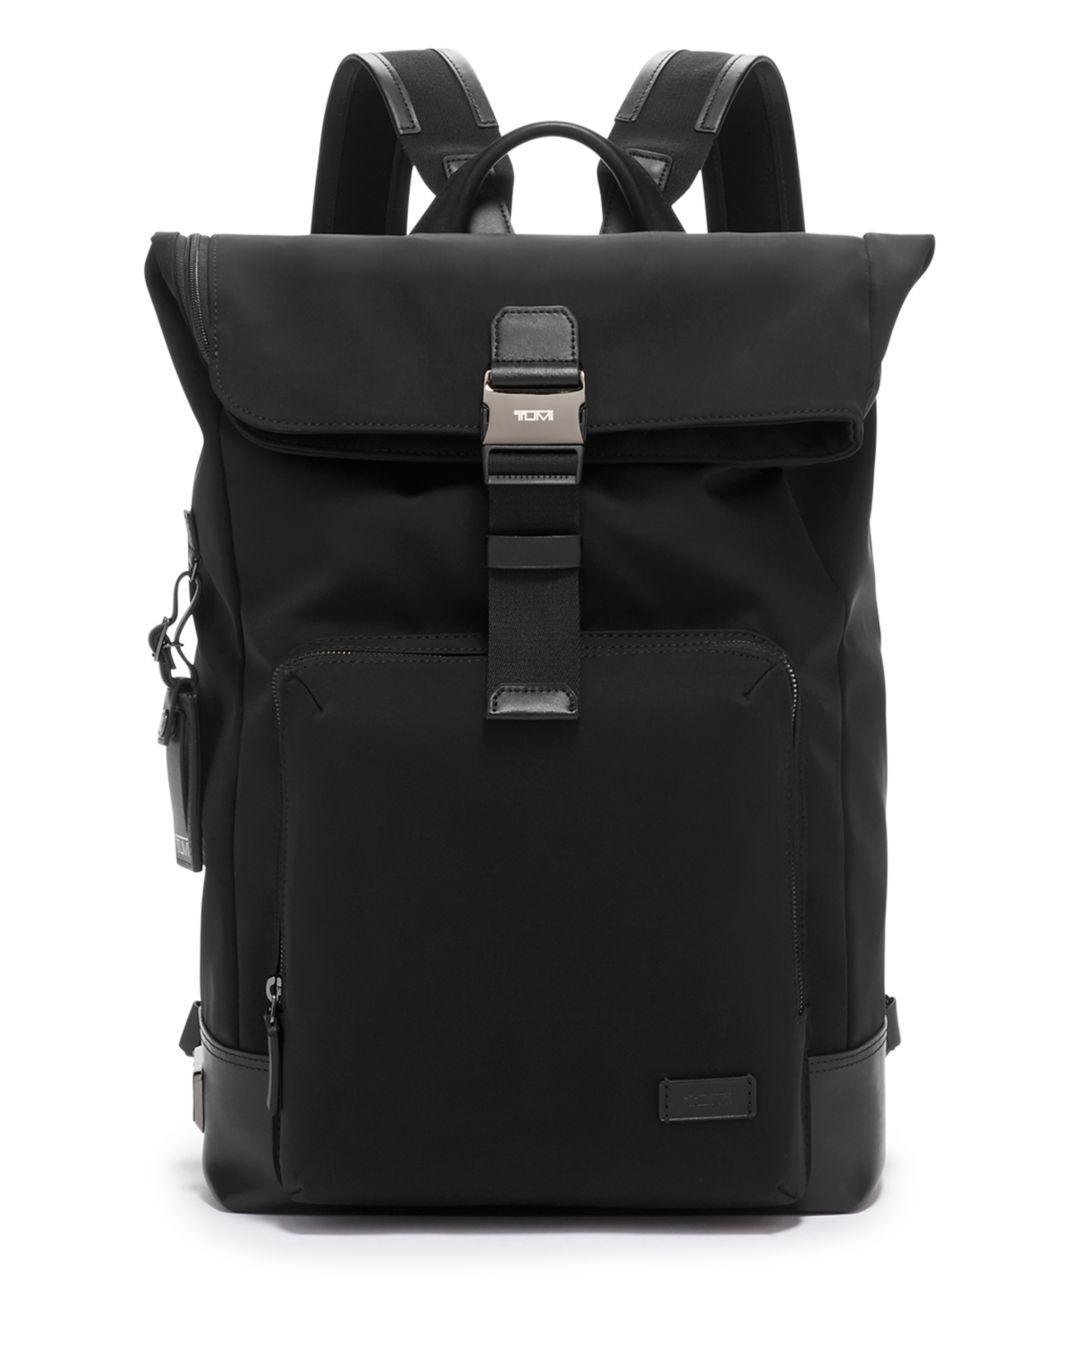 53f04052cf Lyst - Tumi Harrison Oak Roll-top Backpack in Black for Men - Save 11%